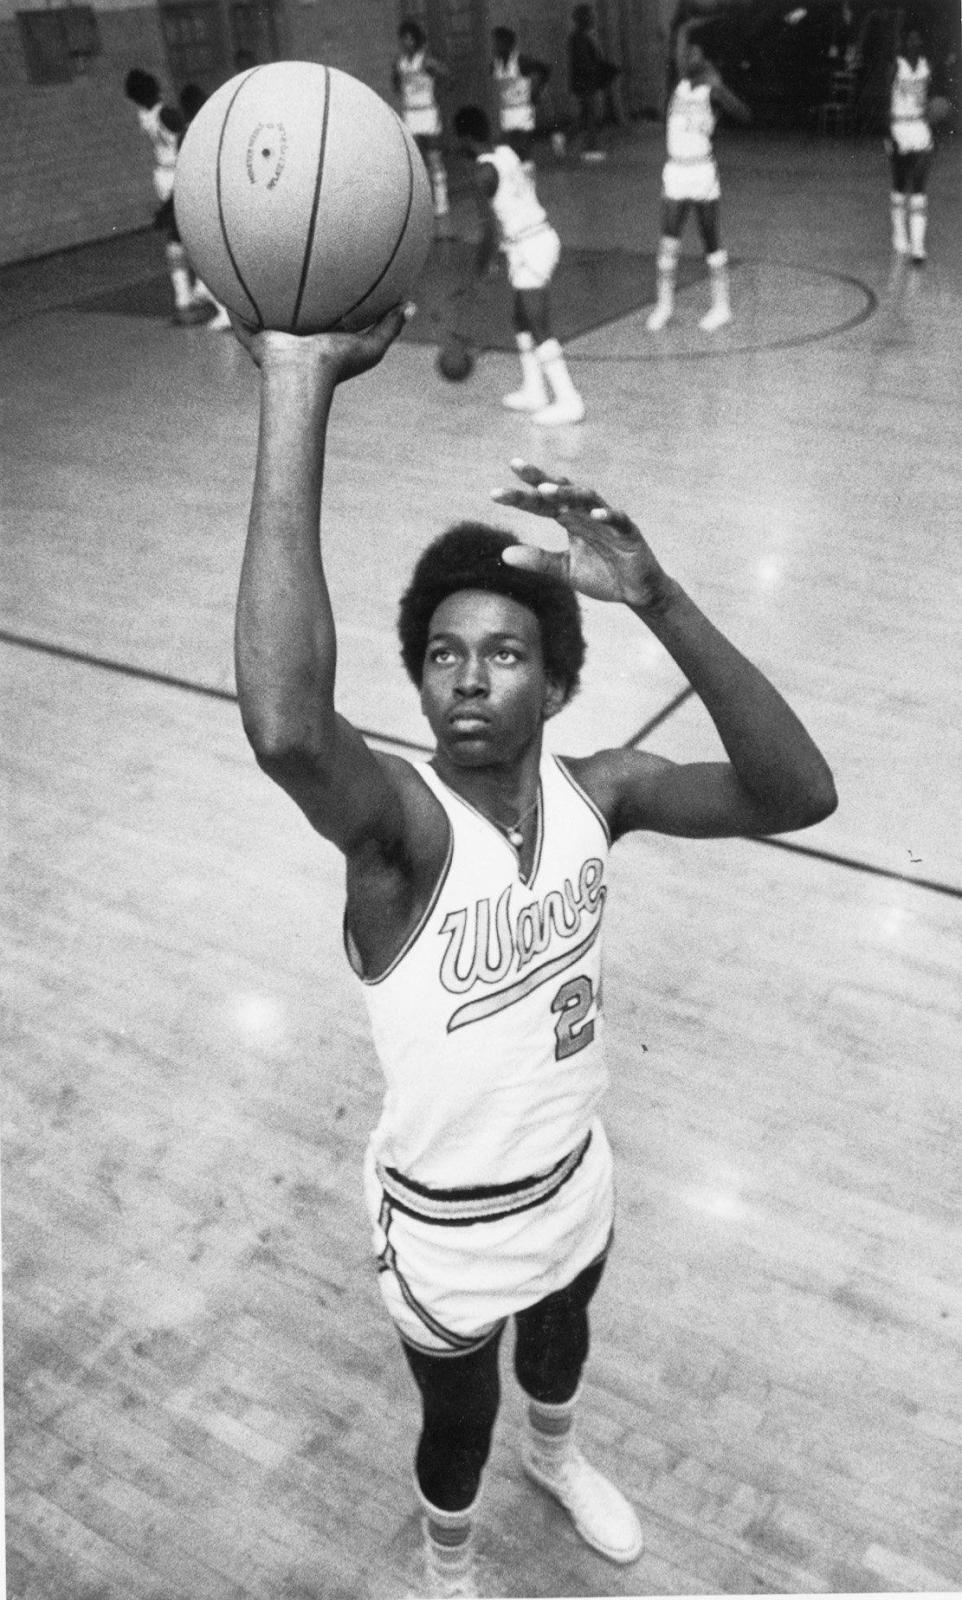 Rebajar Compuesto A merced de  How Kobe Bryant's adidas Deal Shifted the NBA | SoleSavy